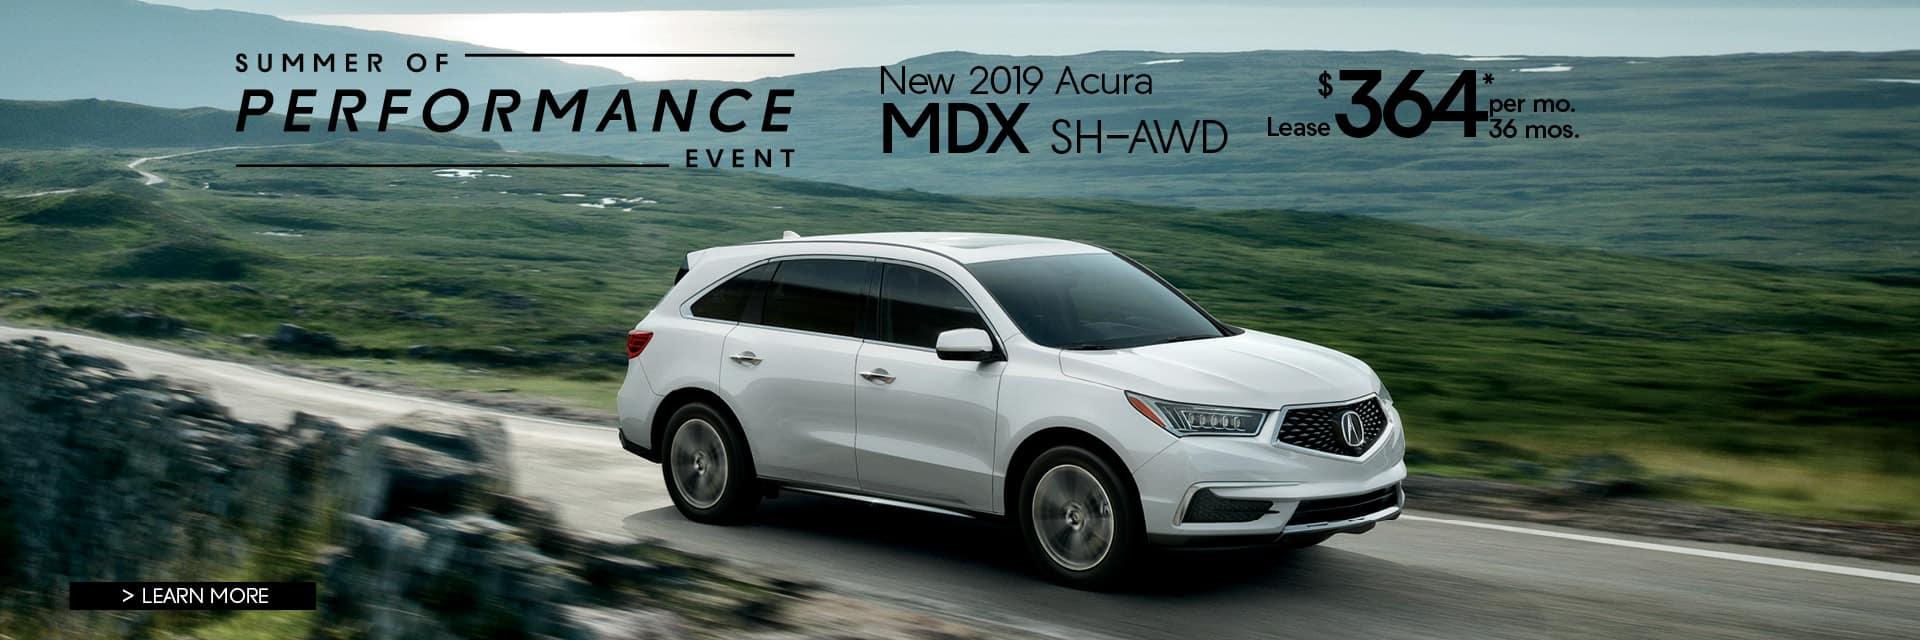 Acura Dealers Long Island >> Rallye Acura Acura And Used Car Dealer In Roslyn Ny Near Manhasset